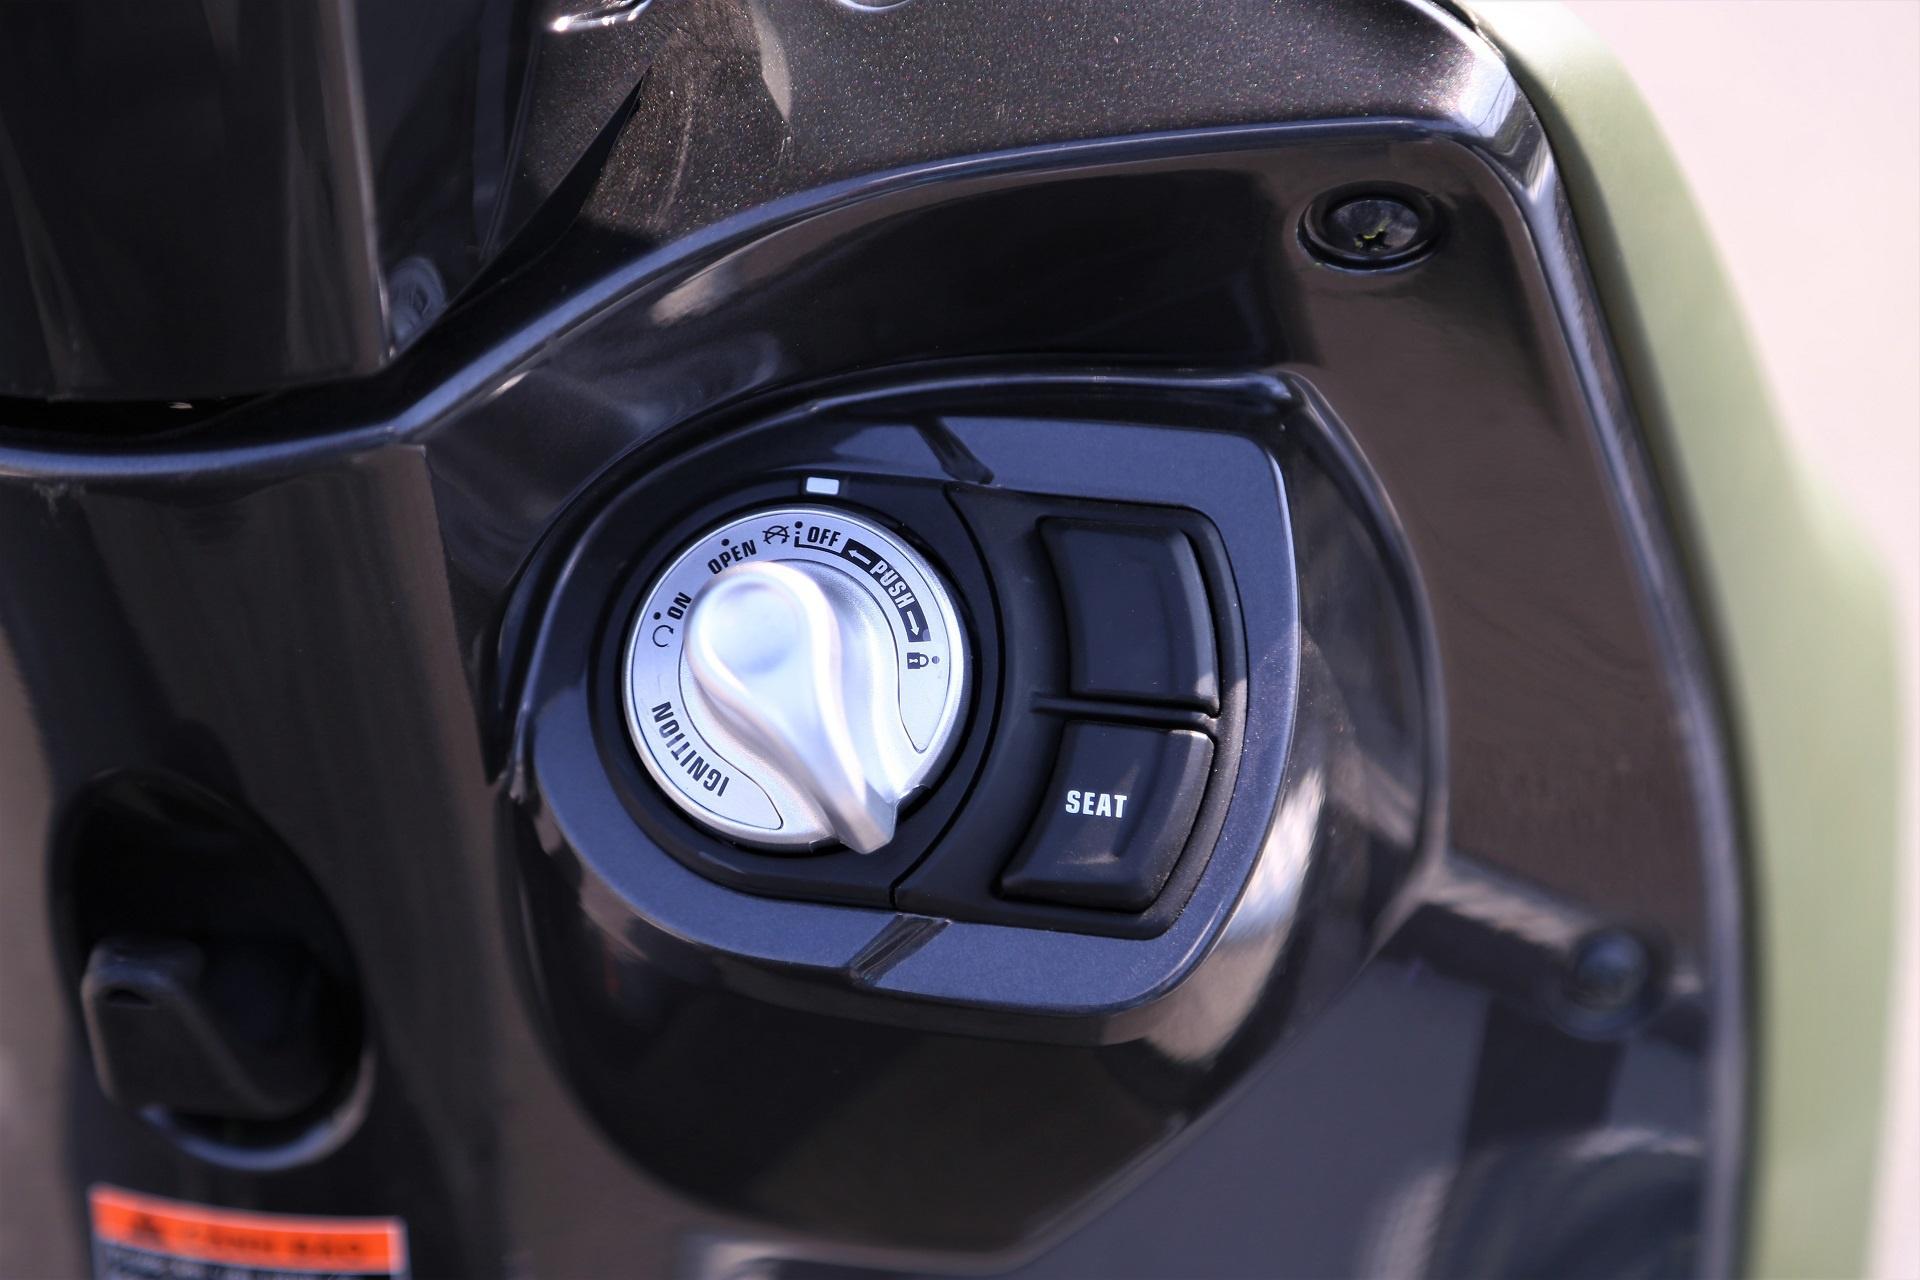 So sanh Honda Scoopy 2021 va Yamaha Janus anh 13